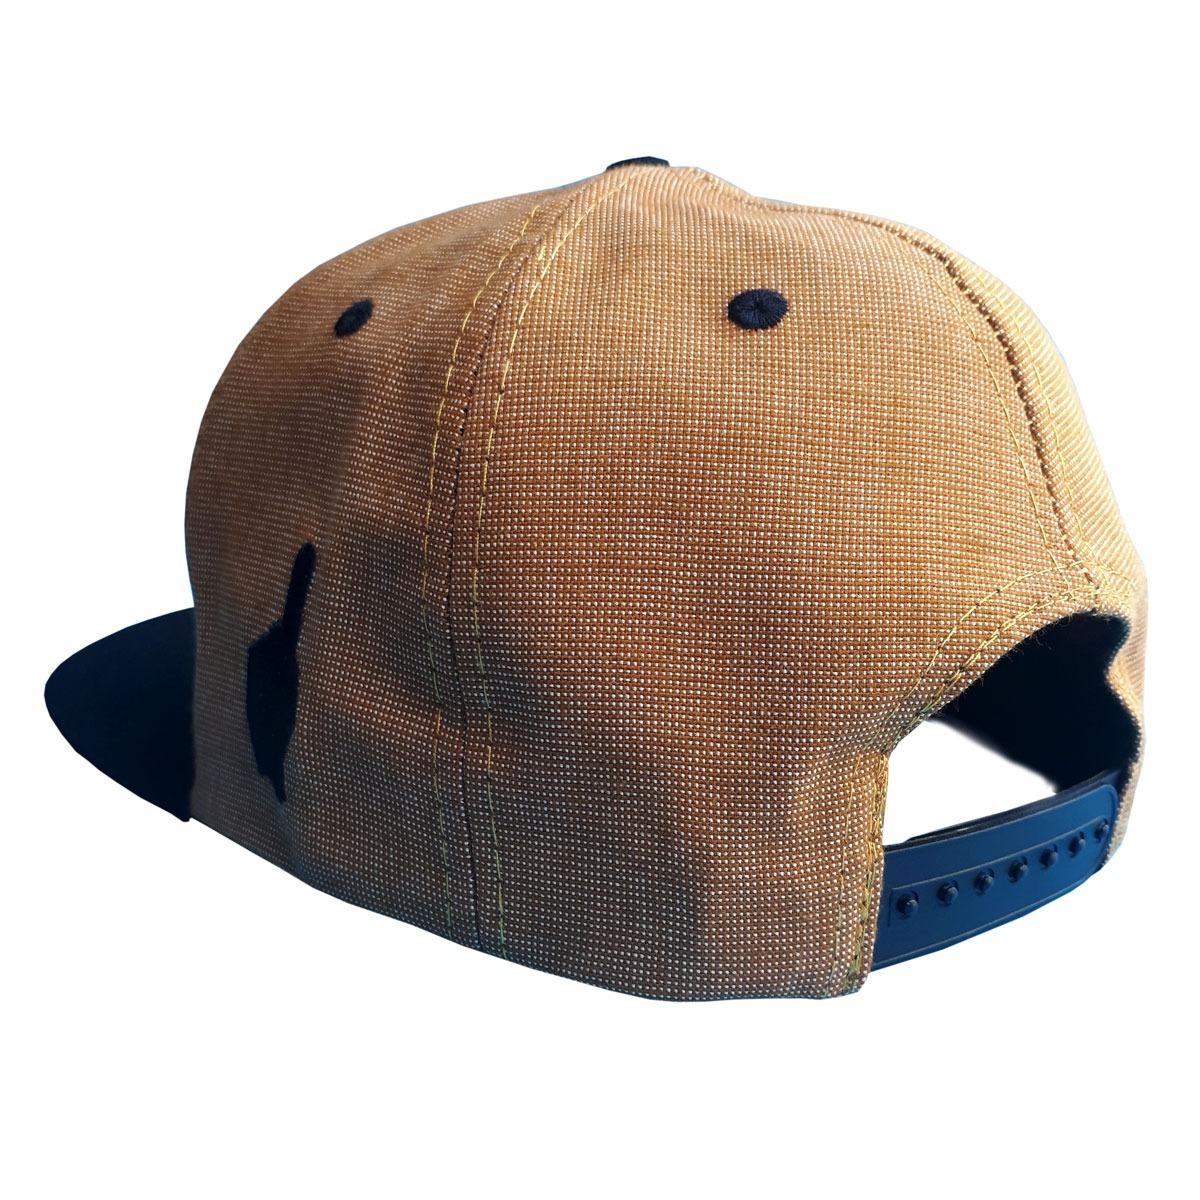 ba69c3fdd1cbc boné aba reta personalizado futebol snapback esporte hat. Carregando zoom.